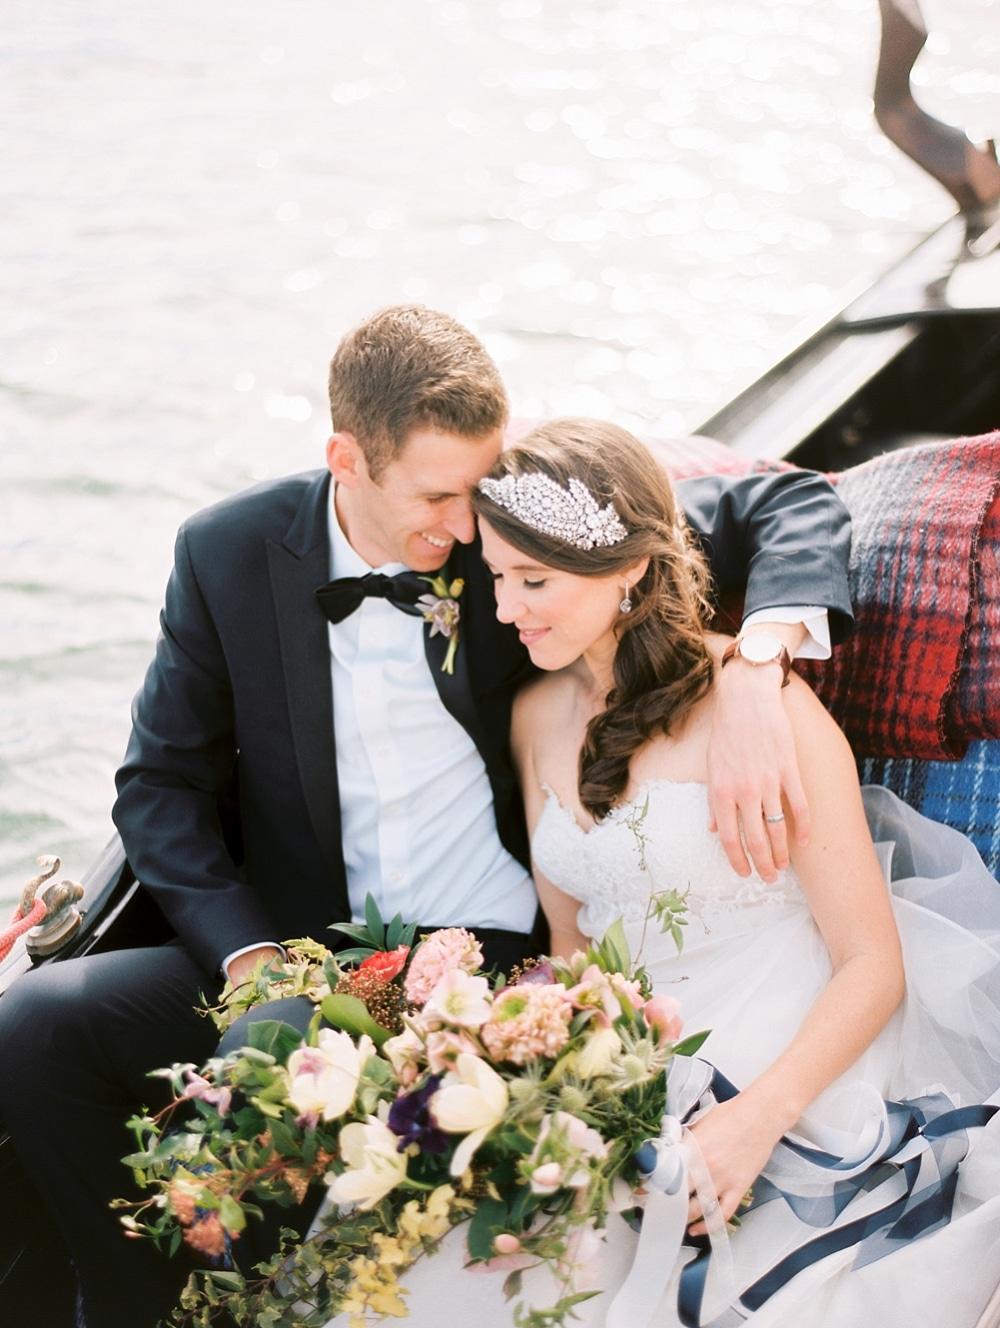 Kristin-La-Voie-Photography-San-Diego-Wedding-Photographer-53